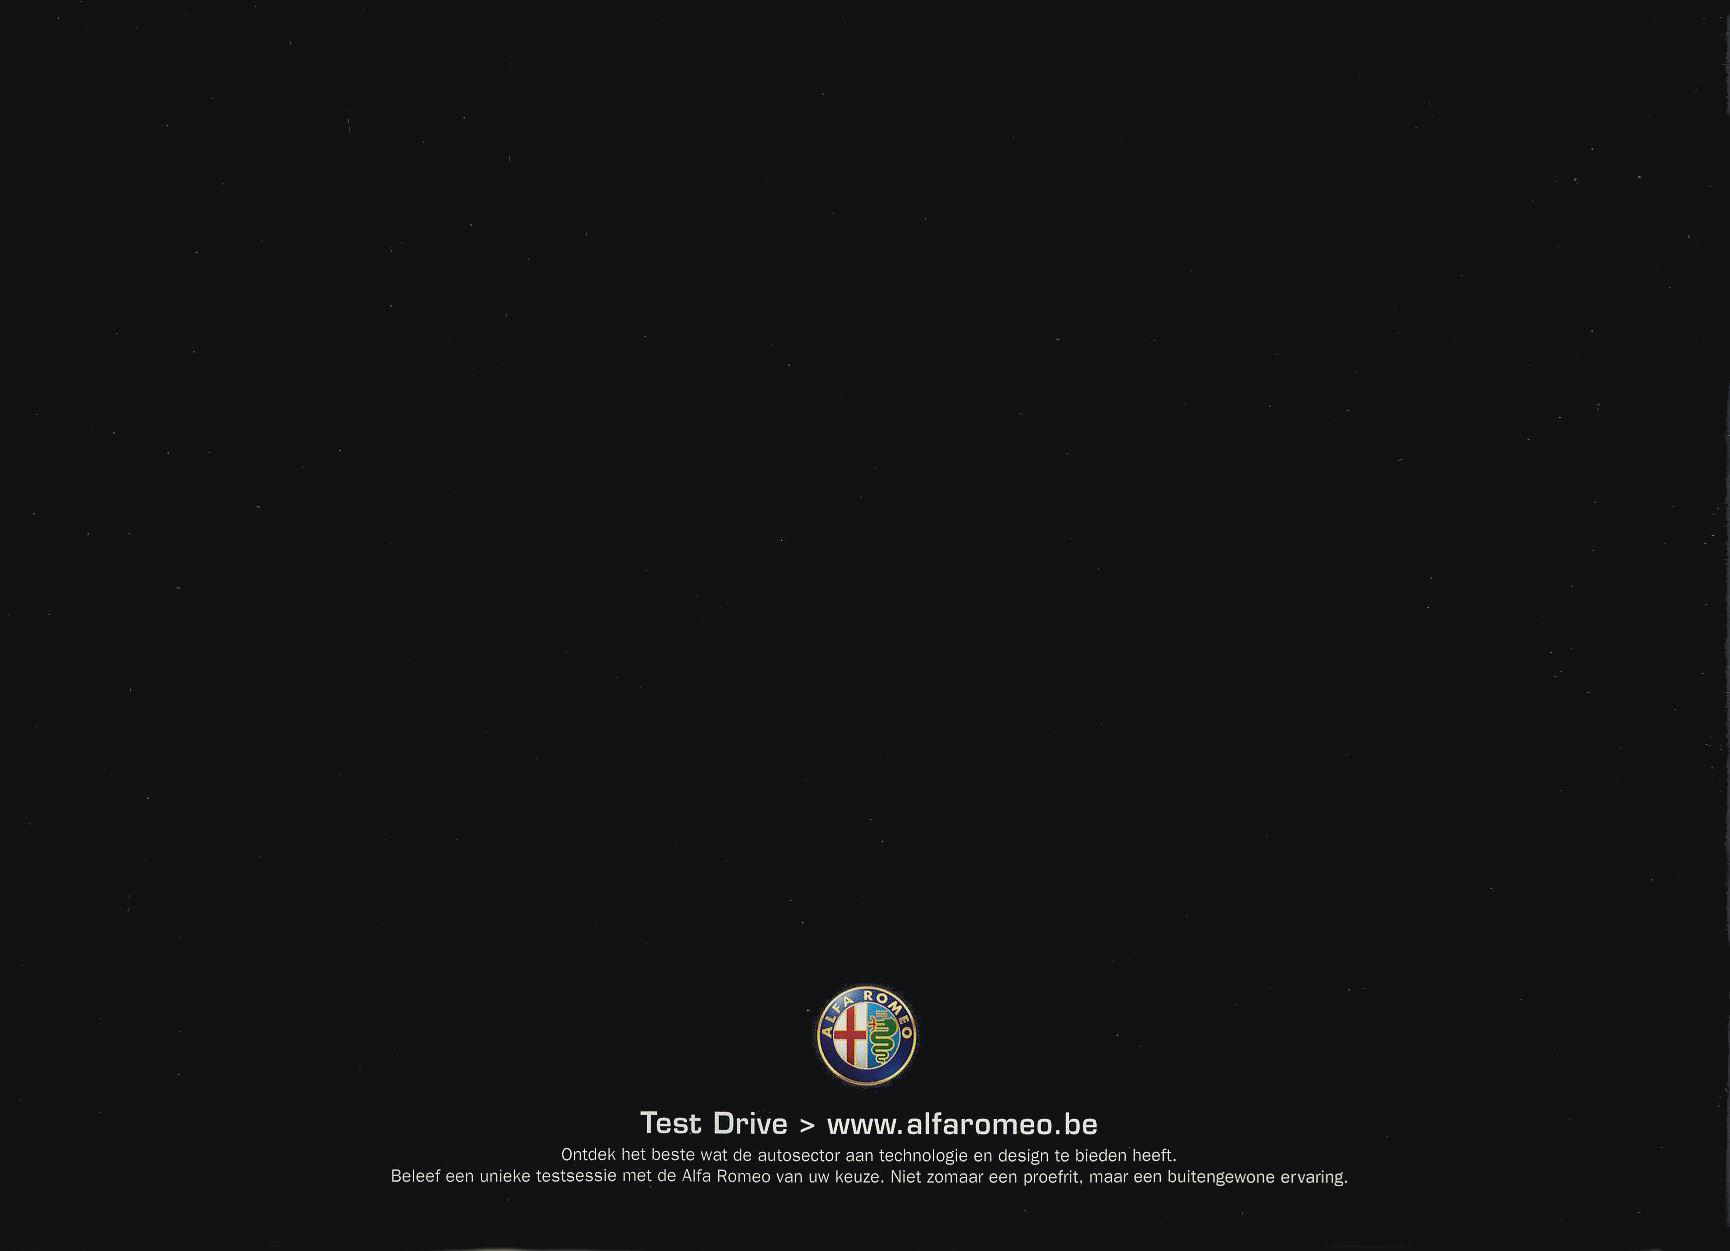 2007 Alfa romeo brochure